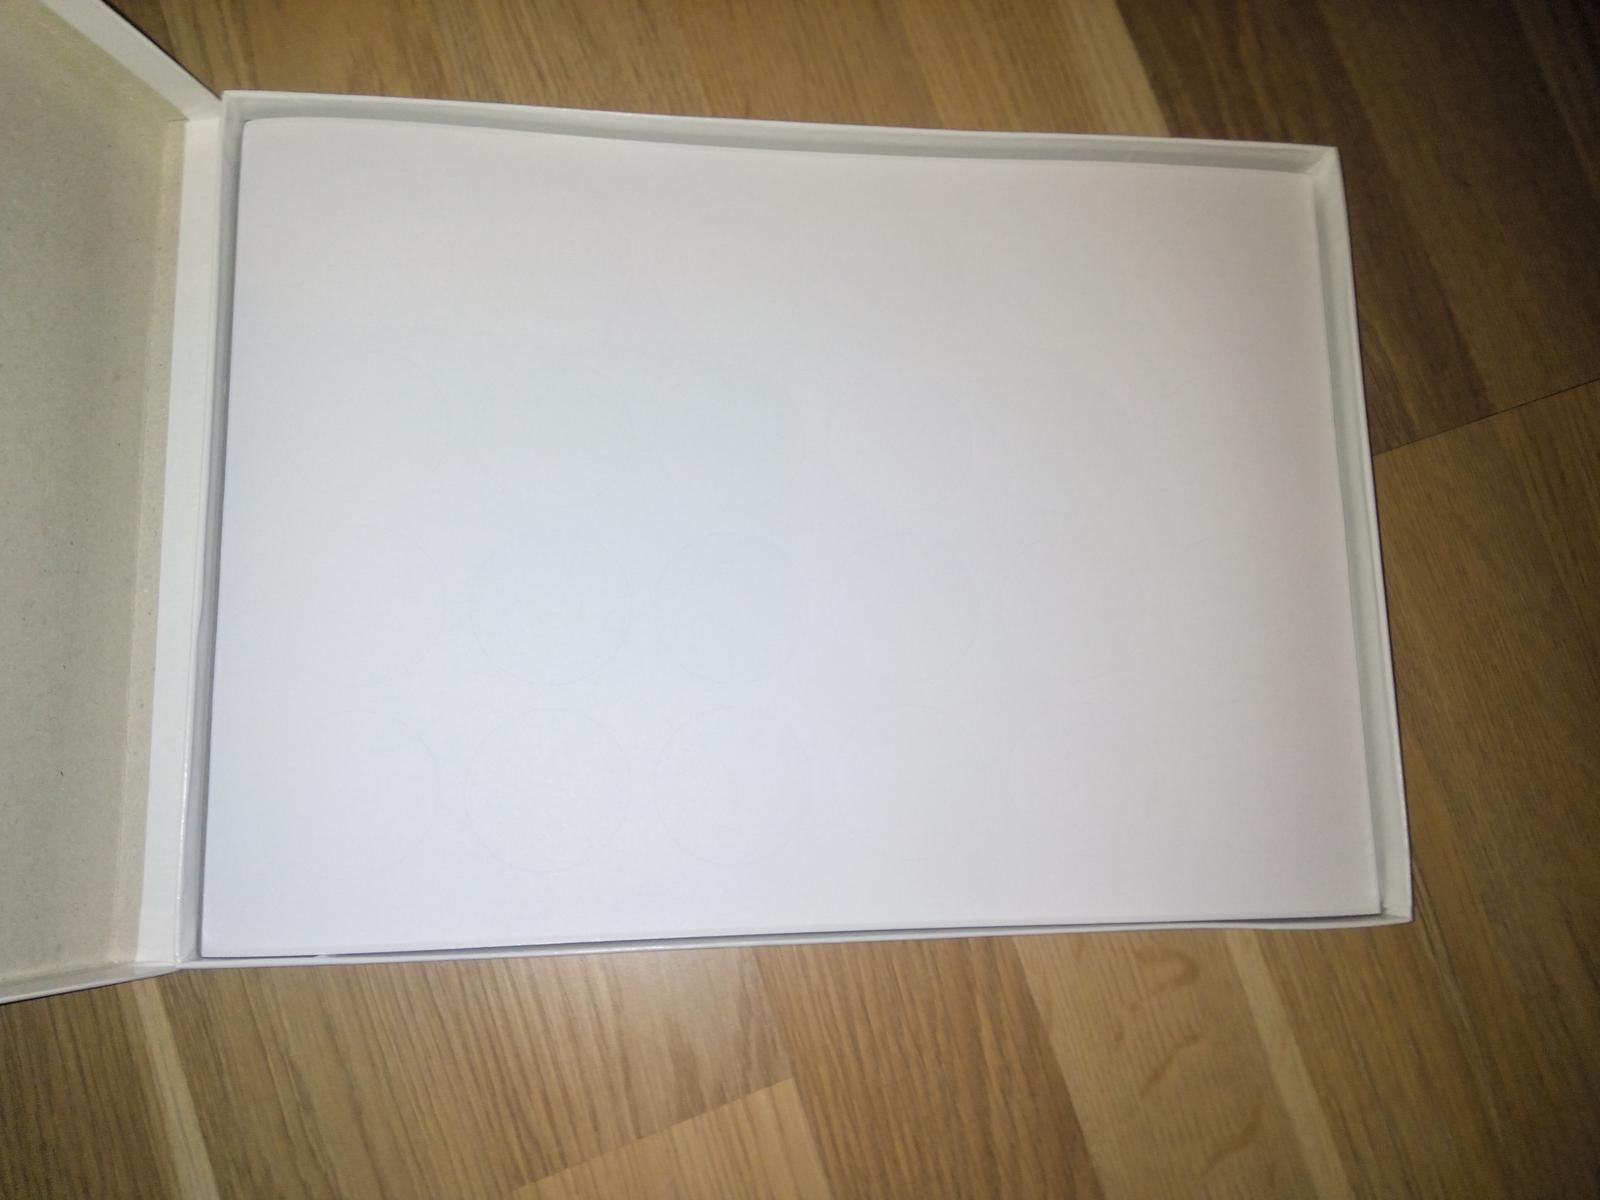 Kulaté etikety, průměr 4cm - Obrázek č. 1